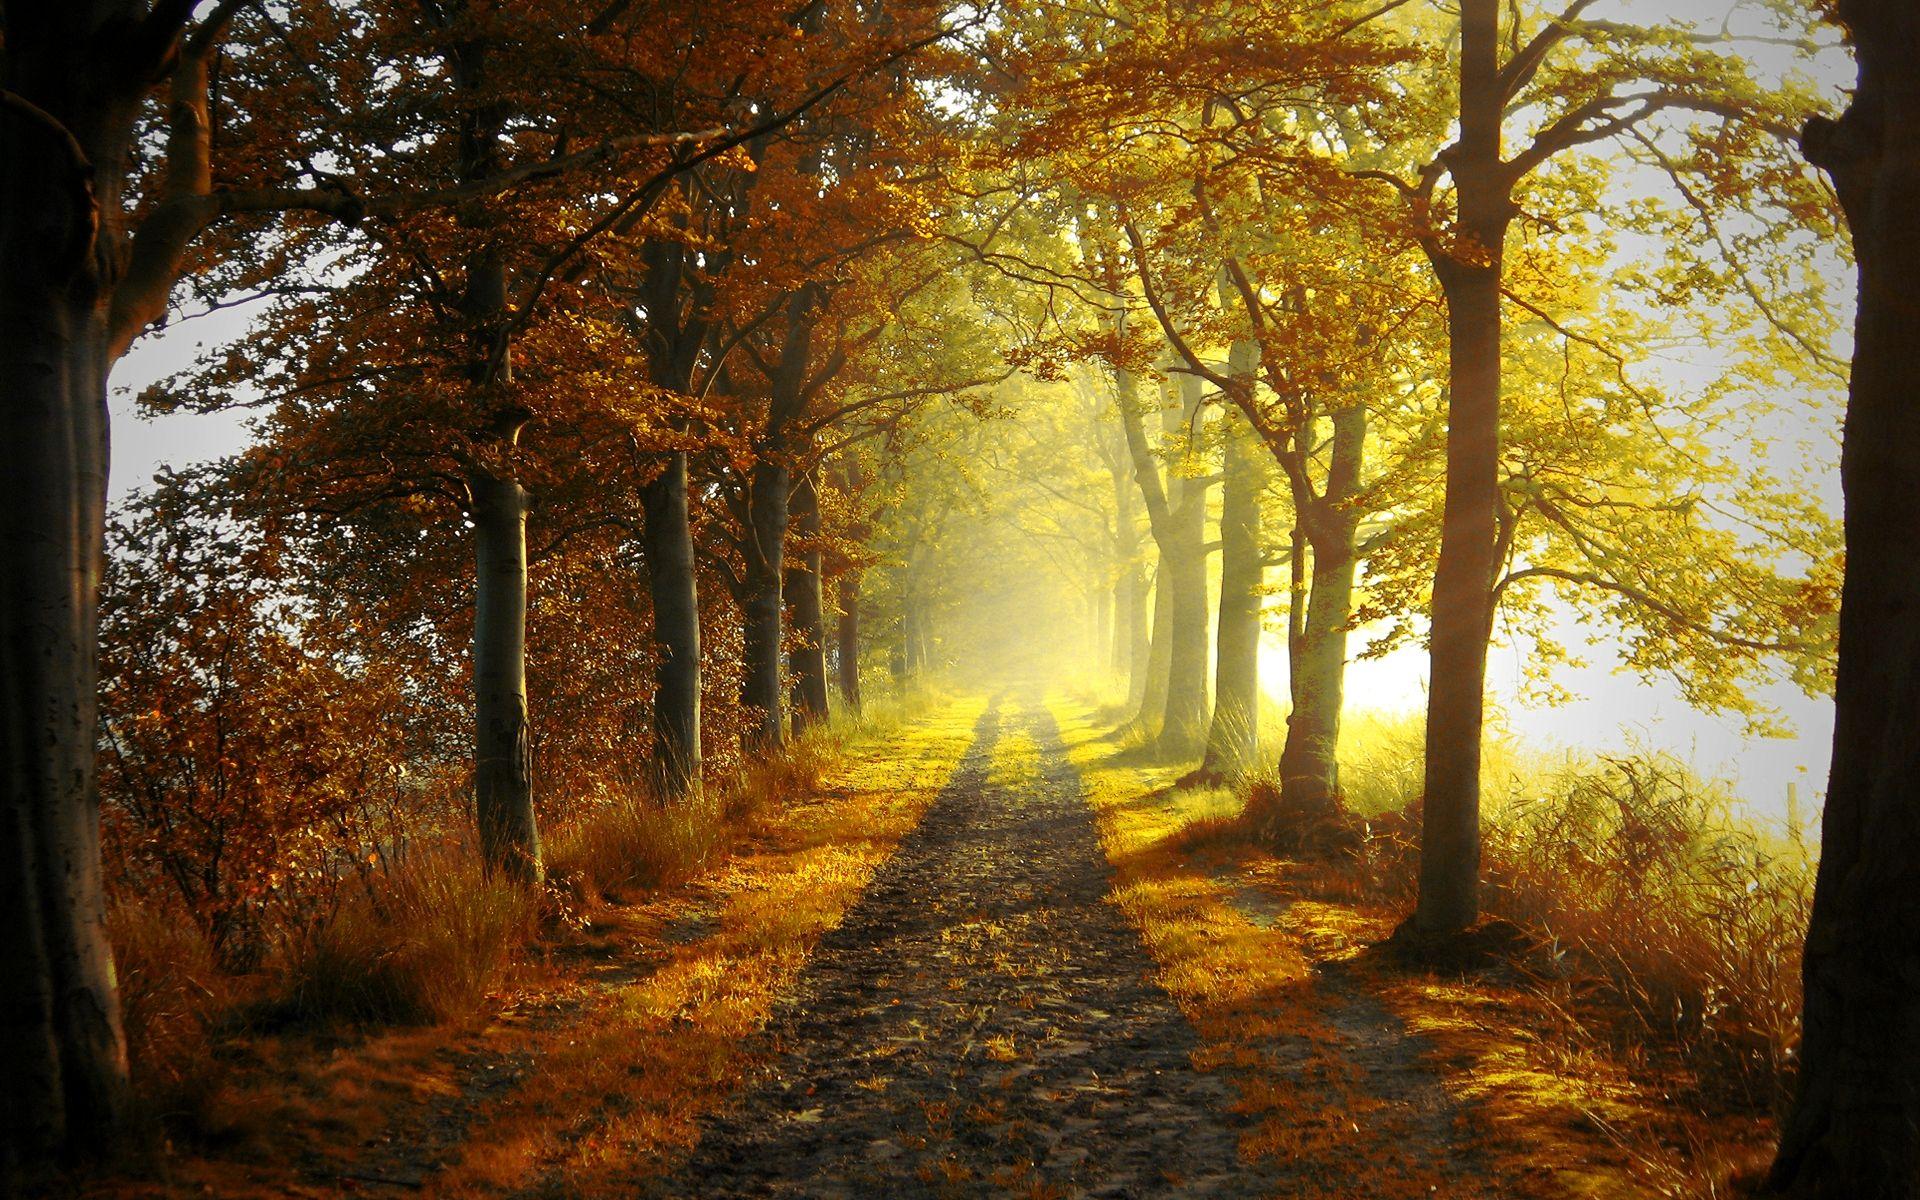 Autumn Forest Light 67551 9635 (1920 1200)